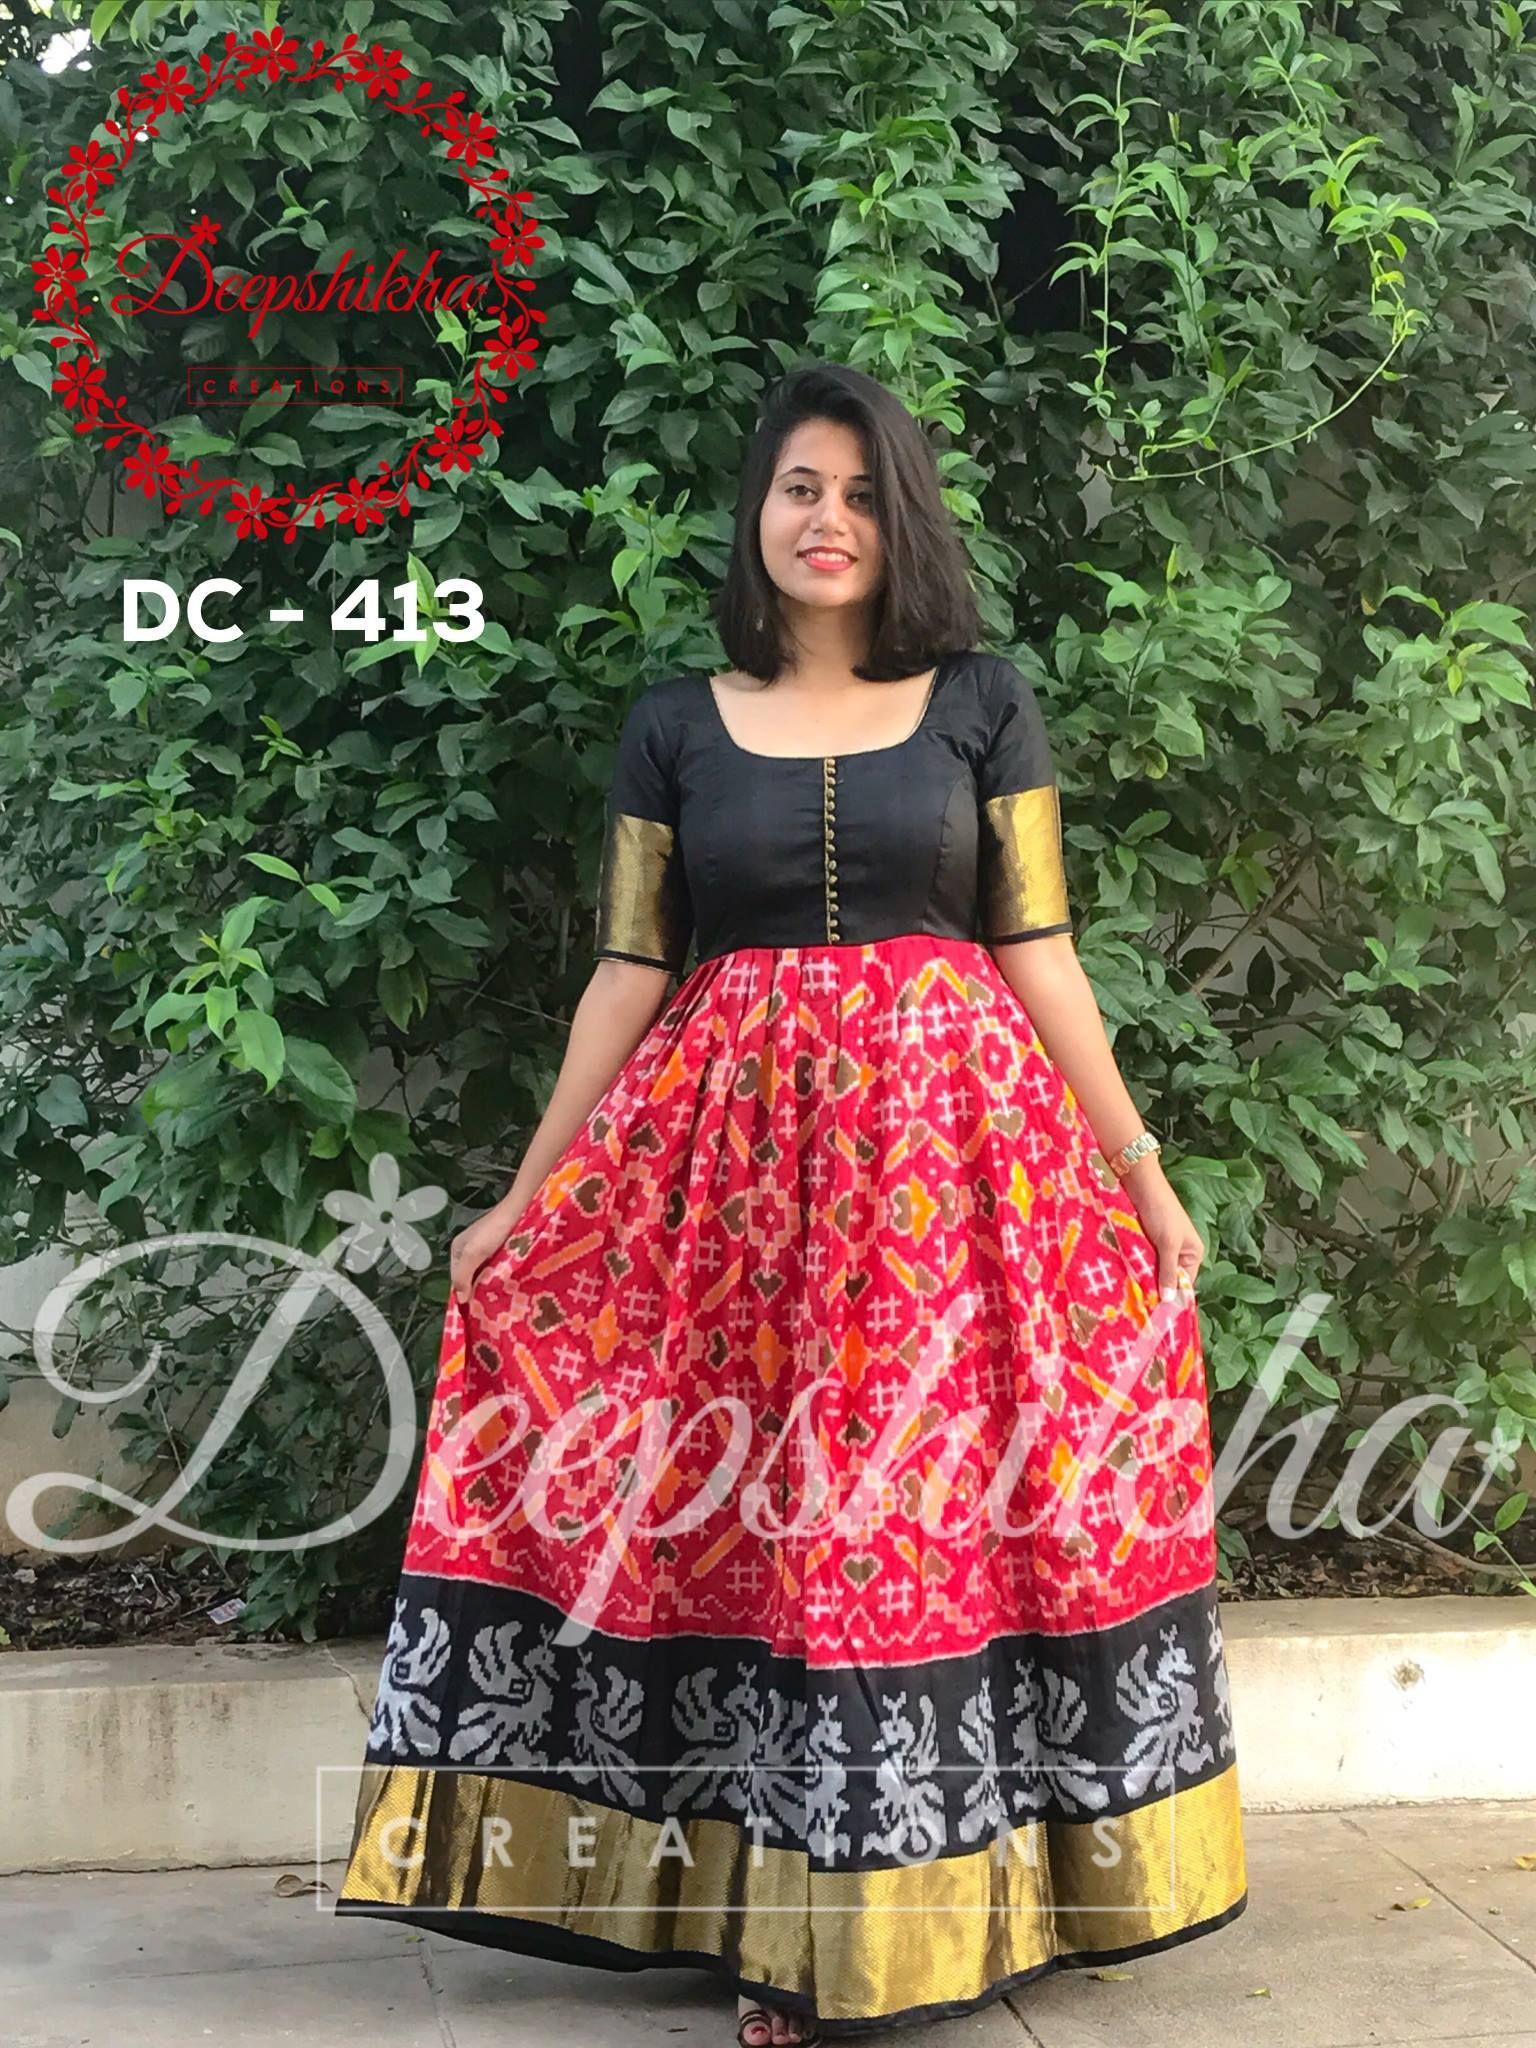 63dd9cac4e36e Deepshikha Creations. Contact   090596 83293. Email   deepshikhacreations  gmail.com.